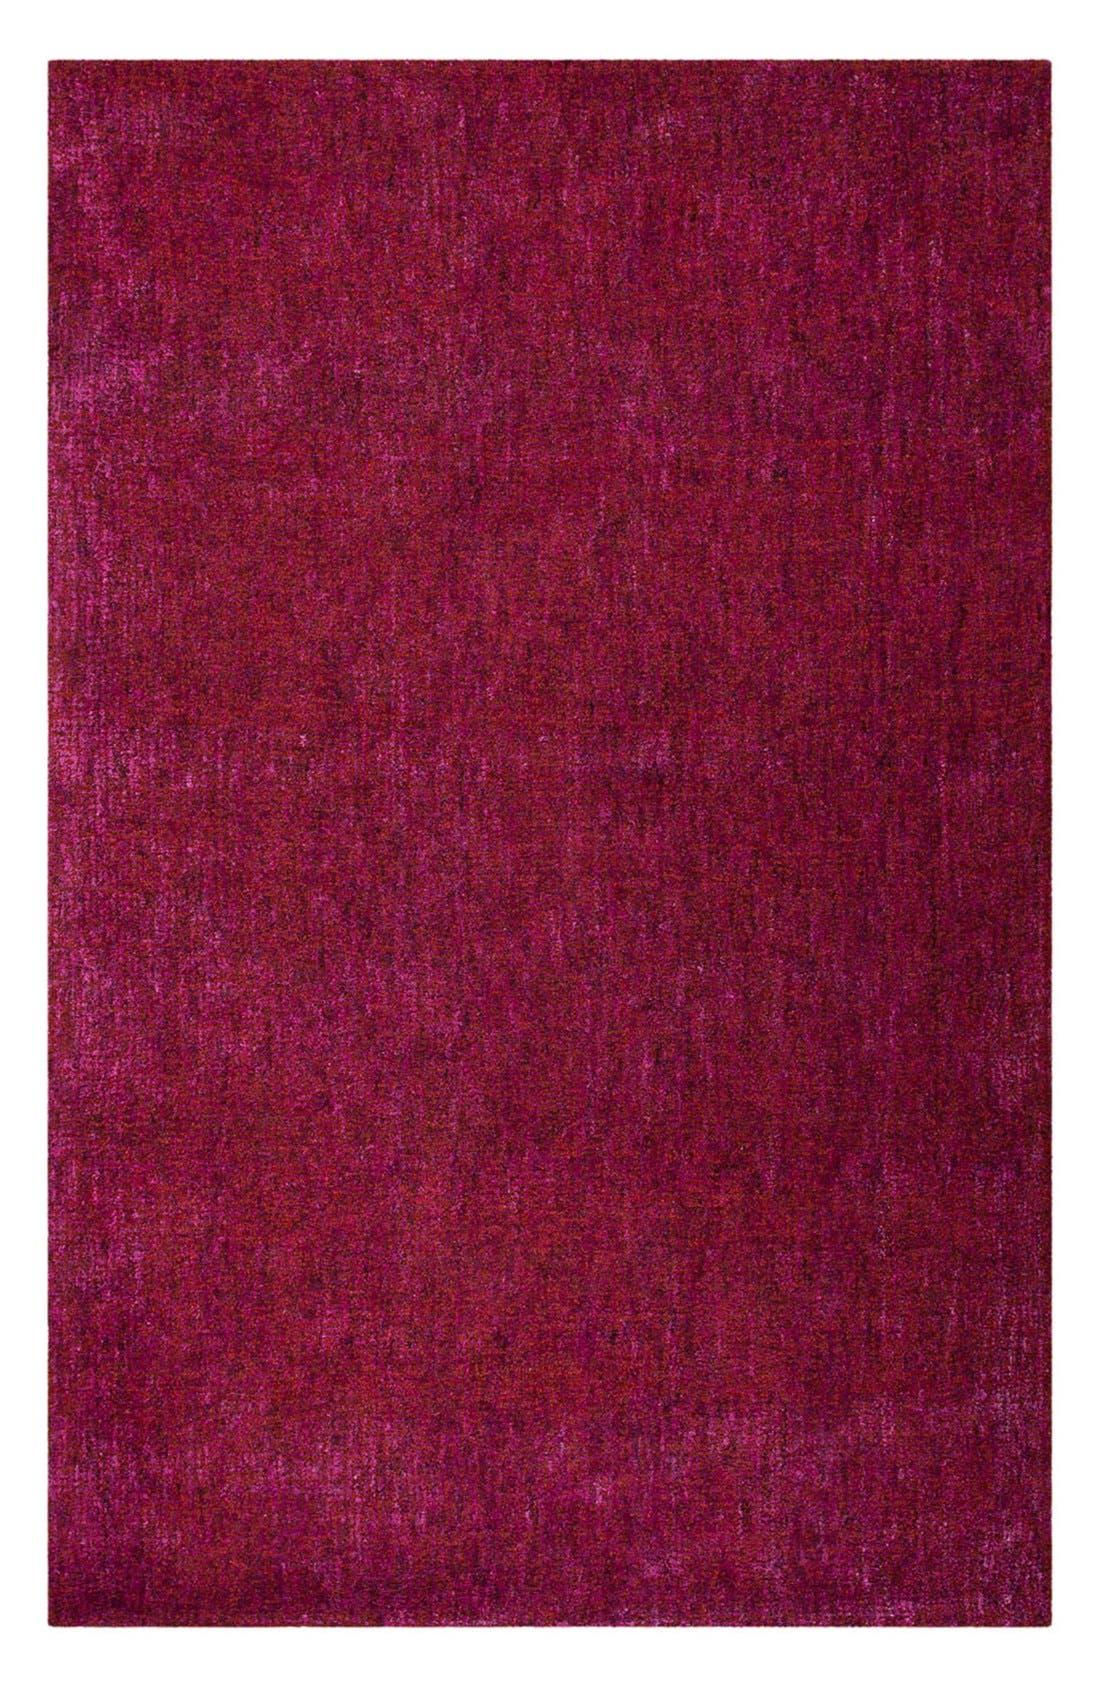 Alternate Image 1 Selected - kate spade new york 'stuyvesant' rug